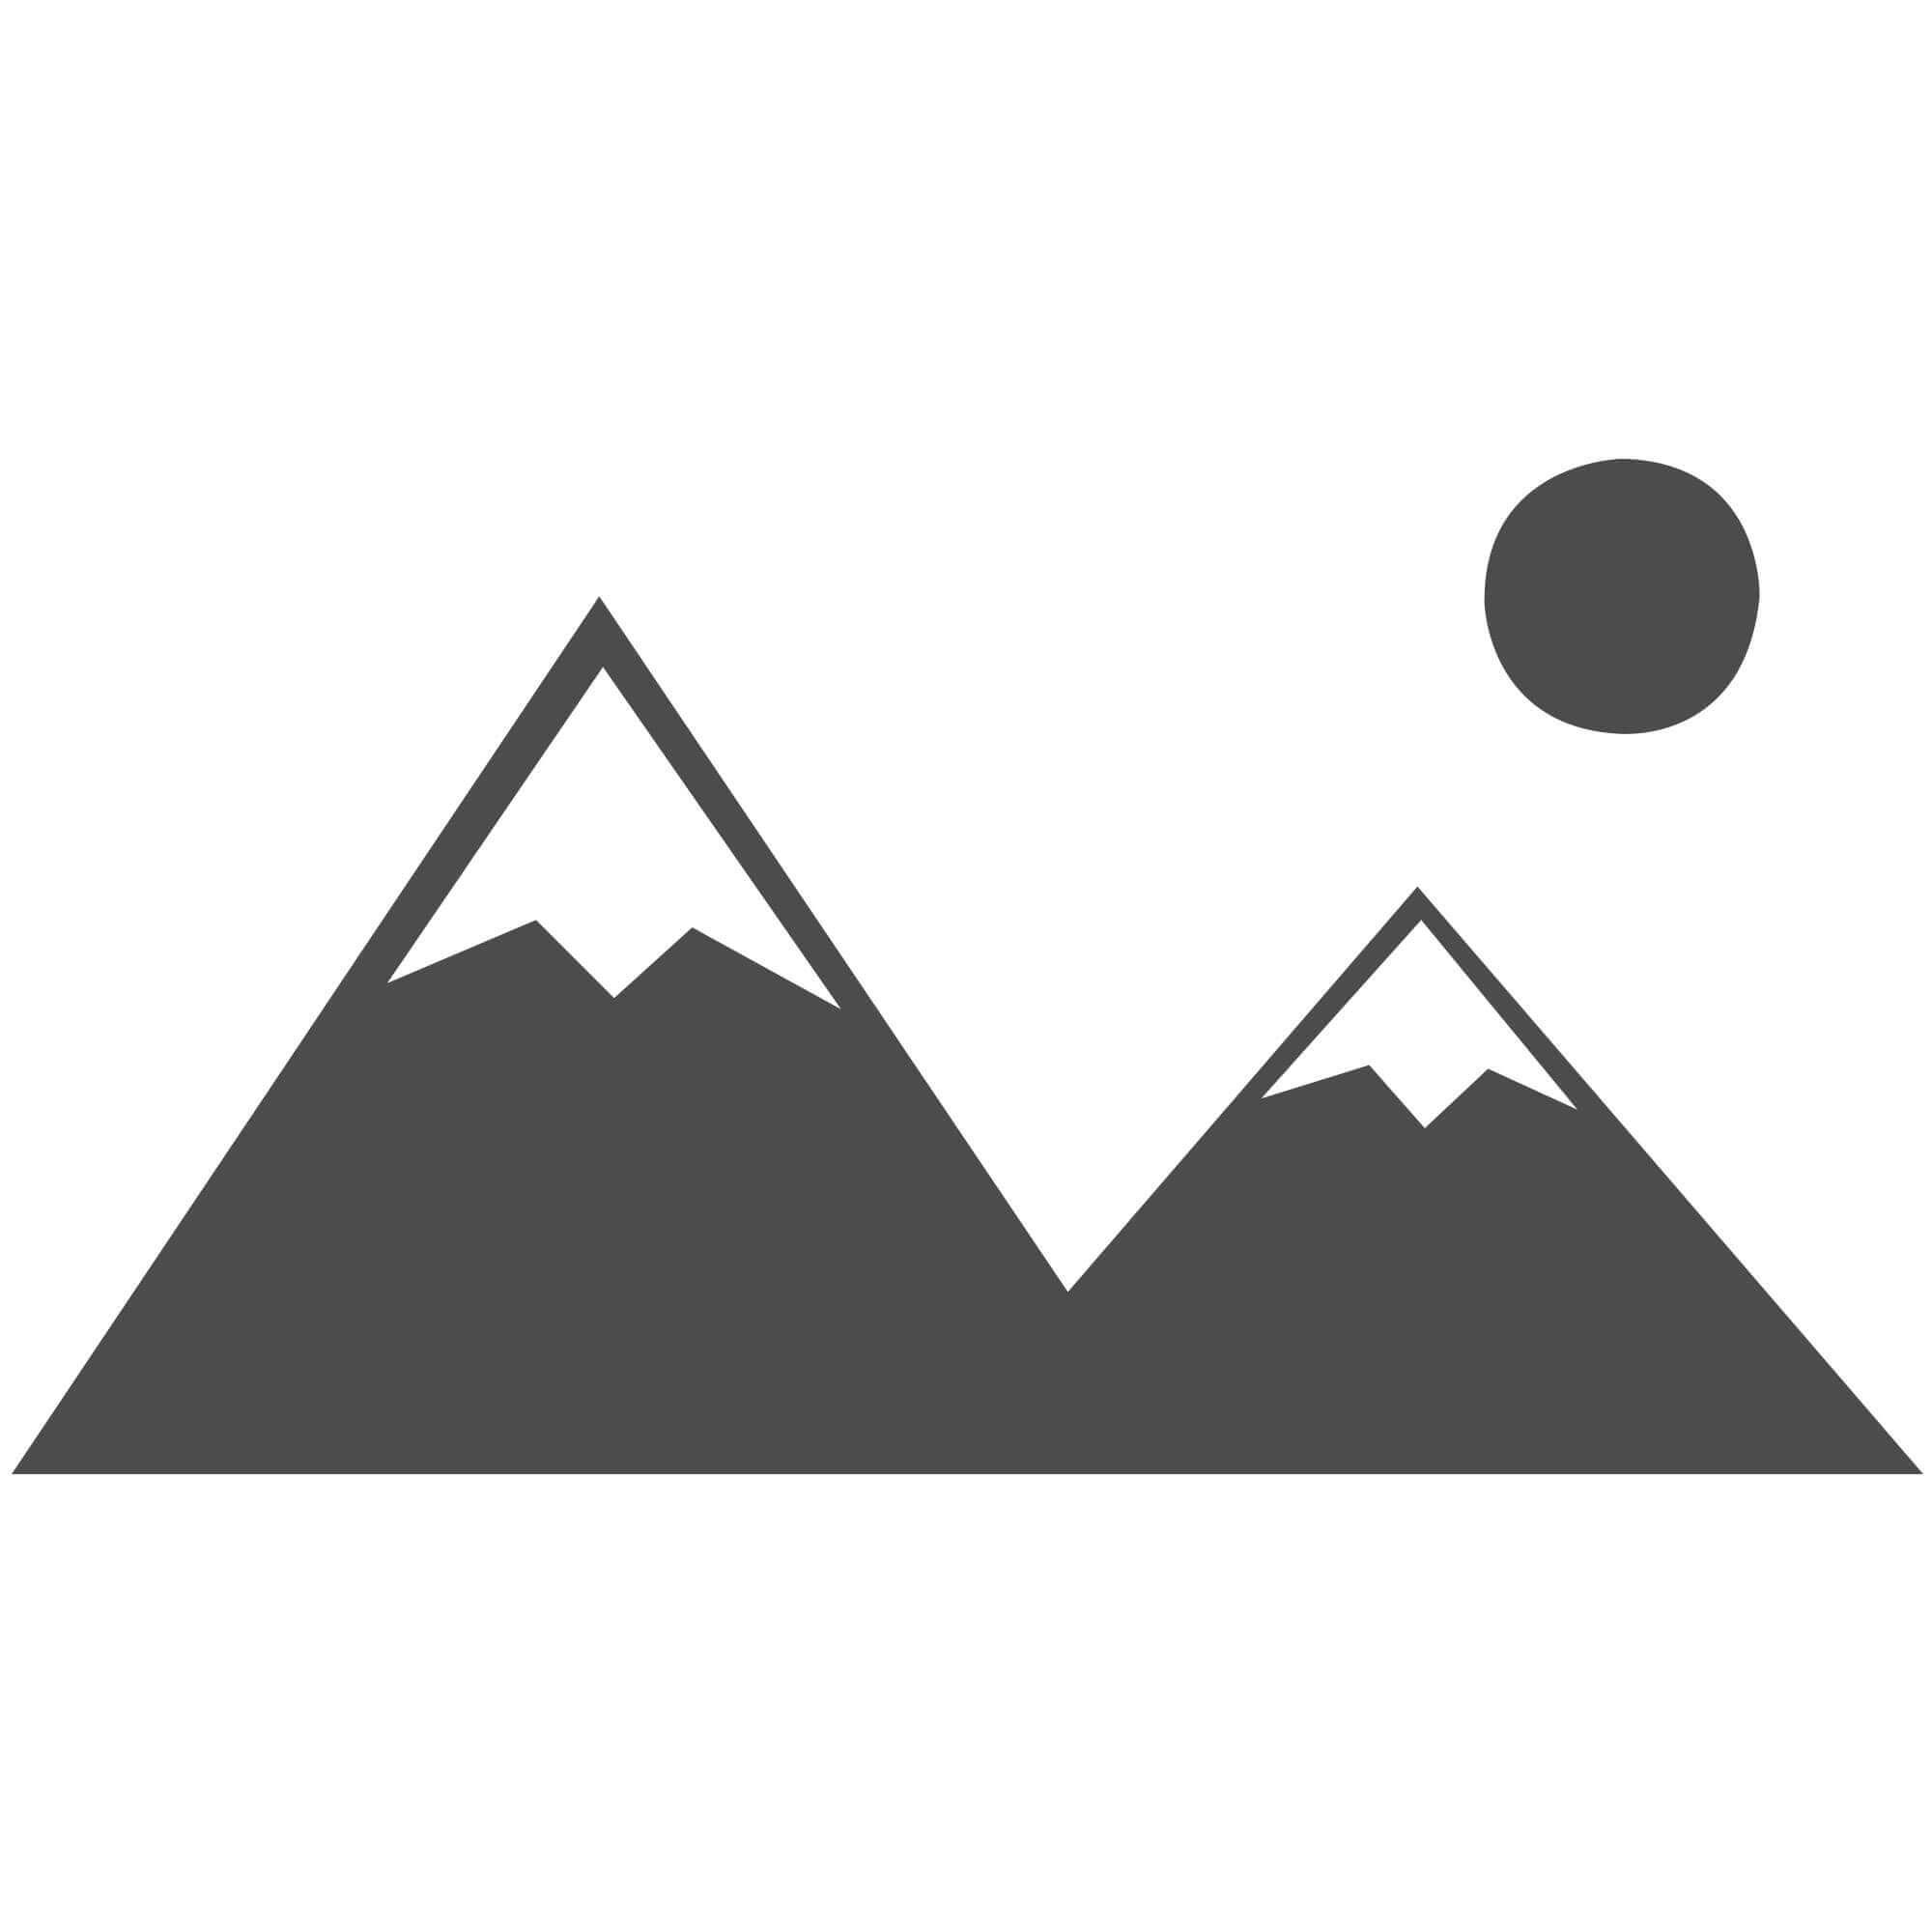 "Splendour Shadow Shaggy Rug - Charcoal - Size 75 x 150 cm (2'6"" x 5')"